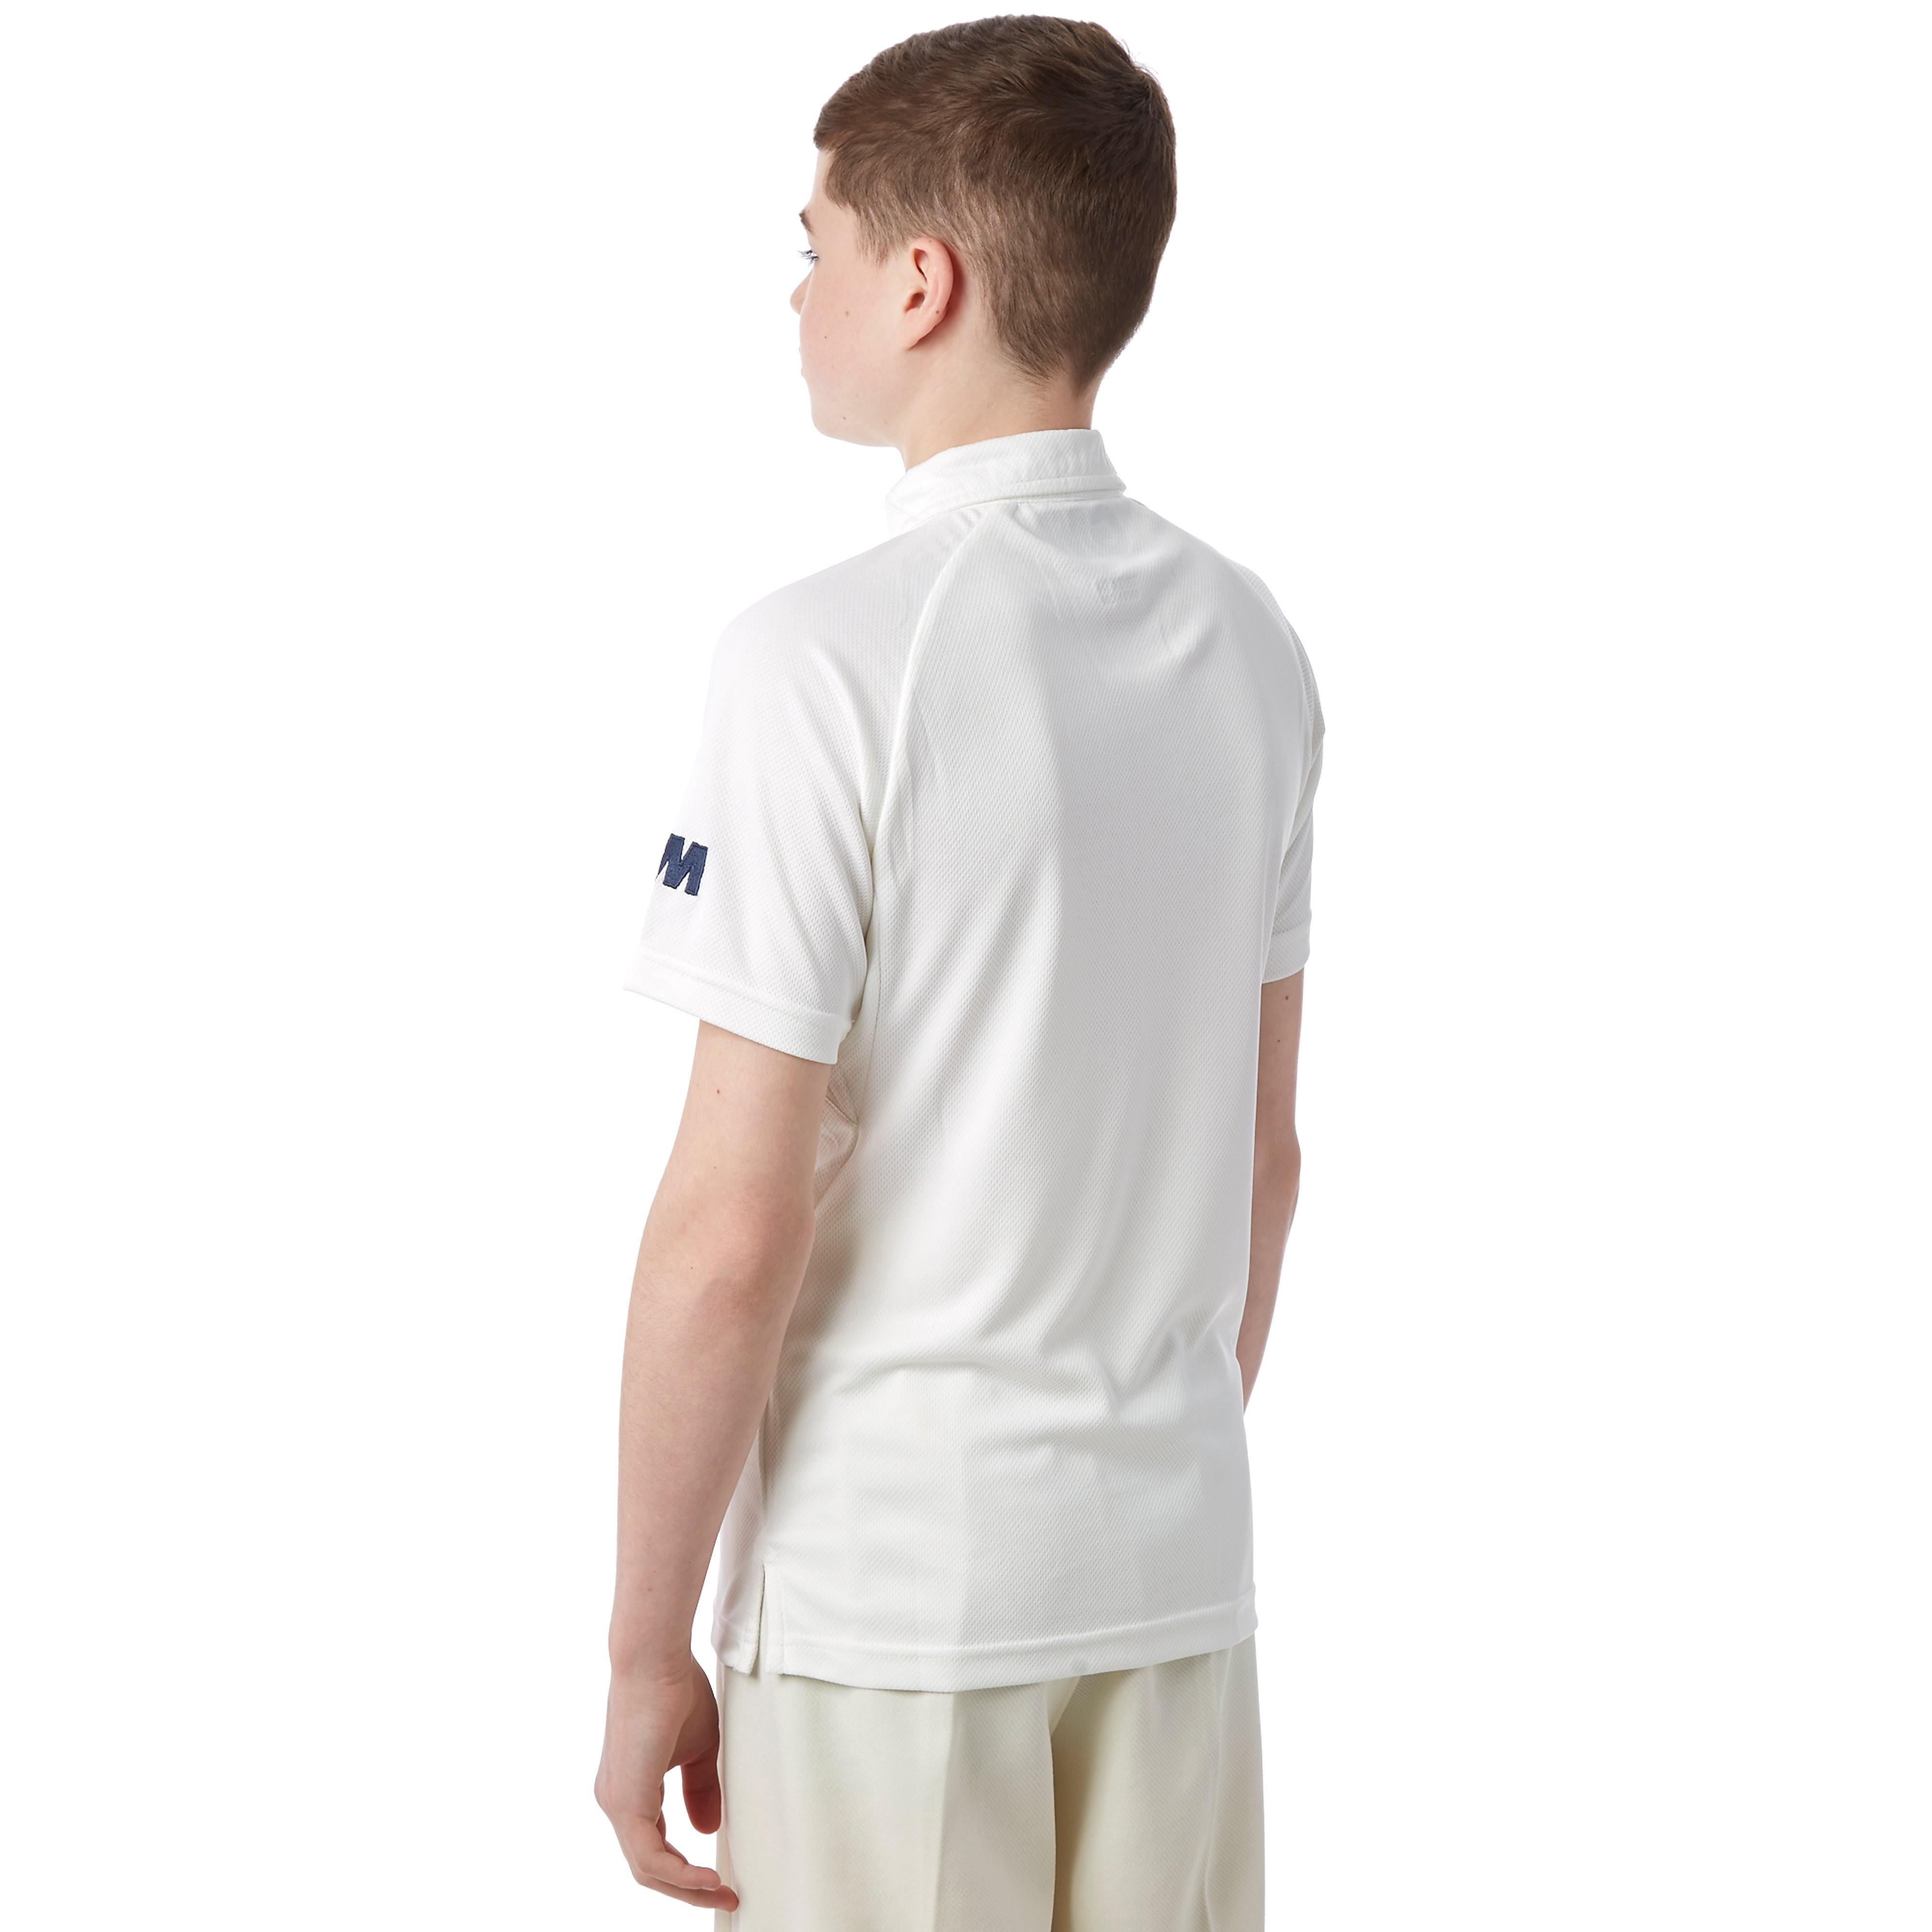 Gunn & Moore Premier Club Short Sleeve Junior Cricket Shirt